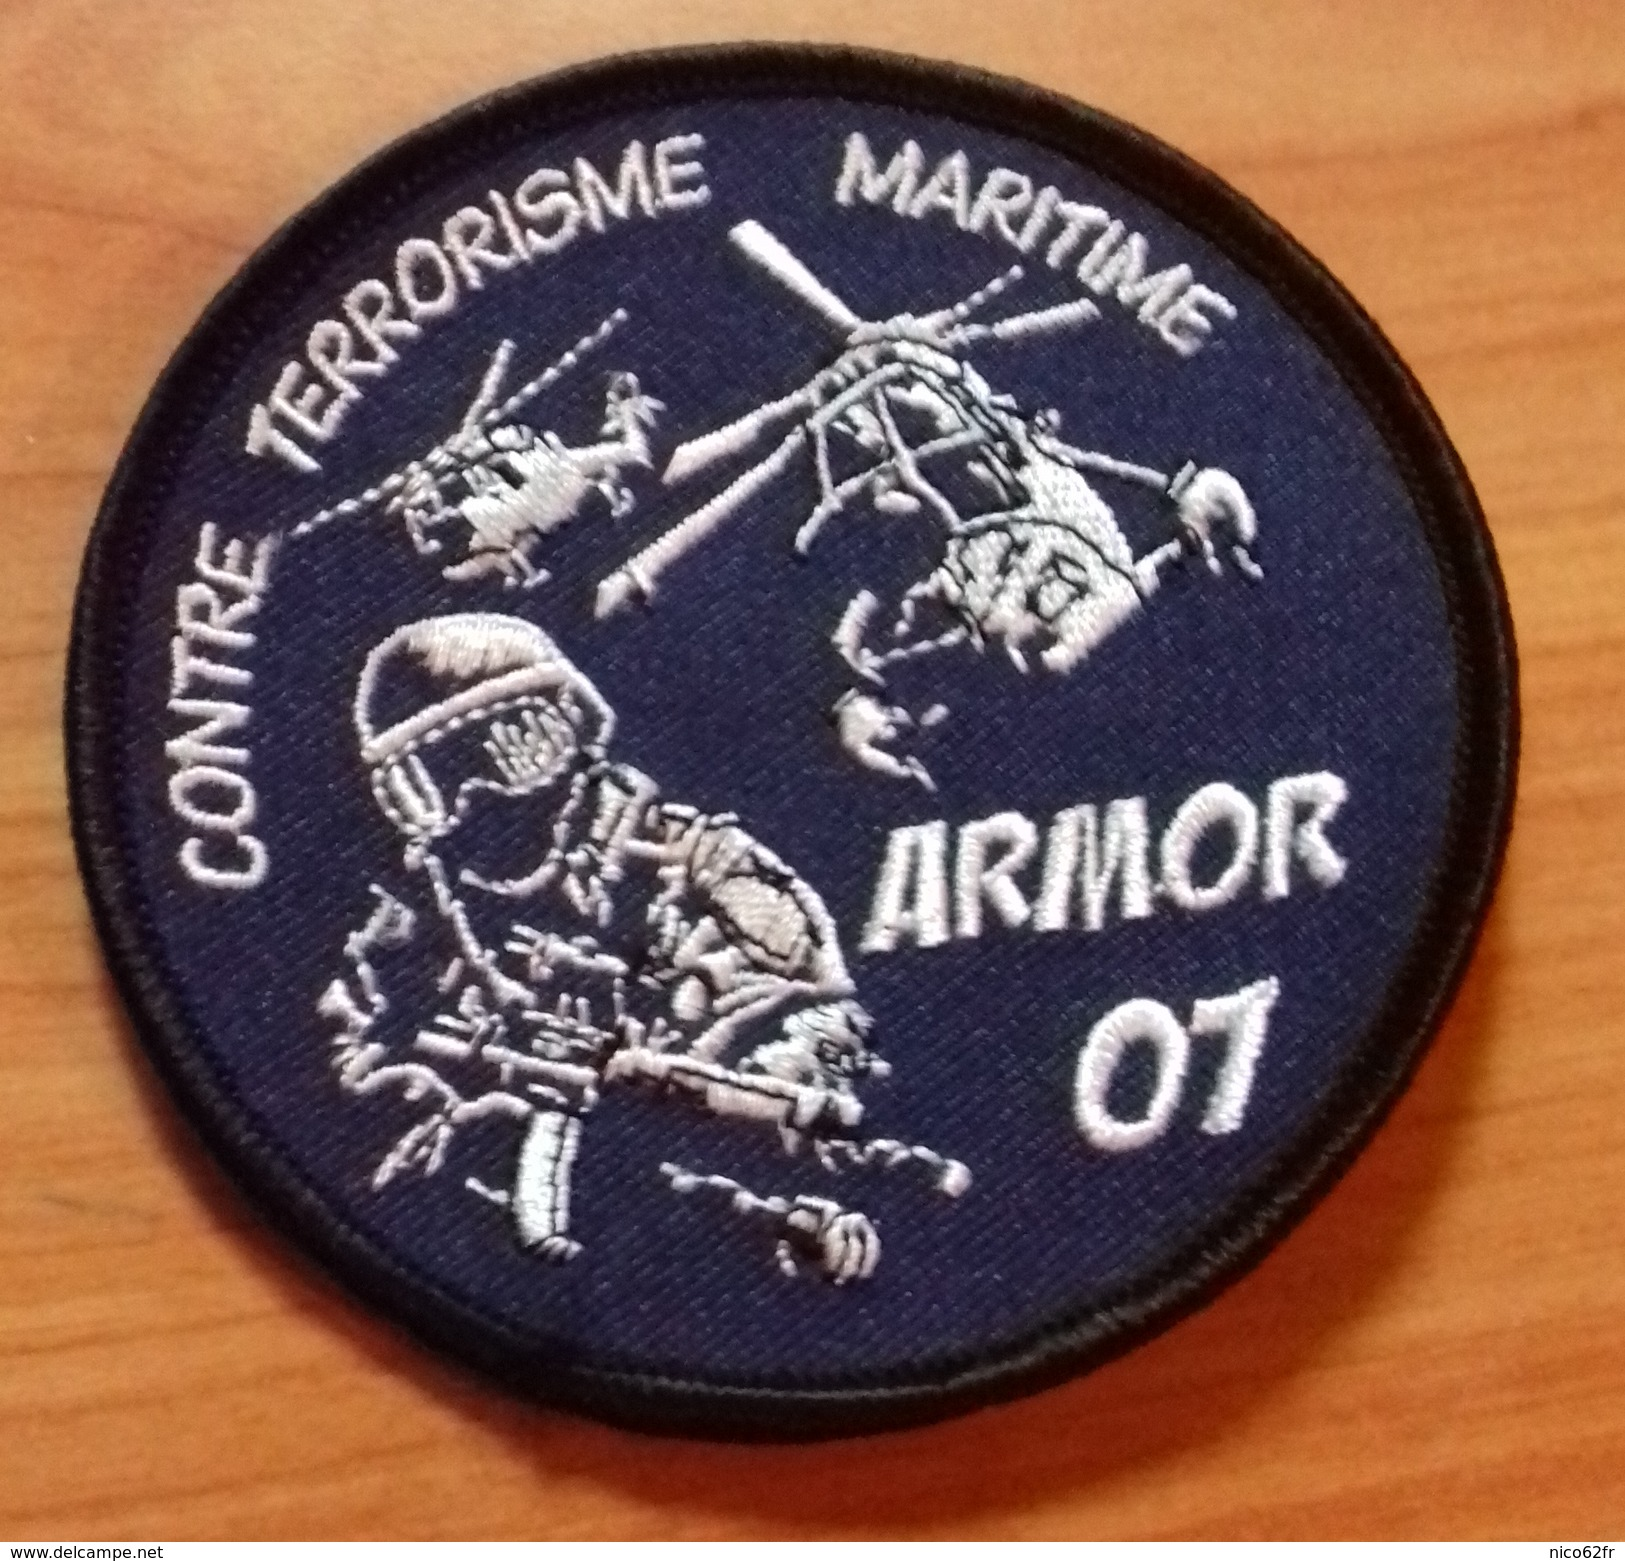 Ecusson Gendarmerie Nationale / Marine Nationale / Commando Marine - Police